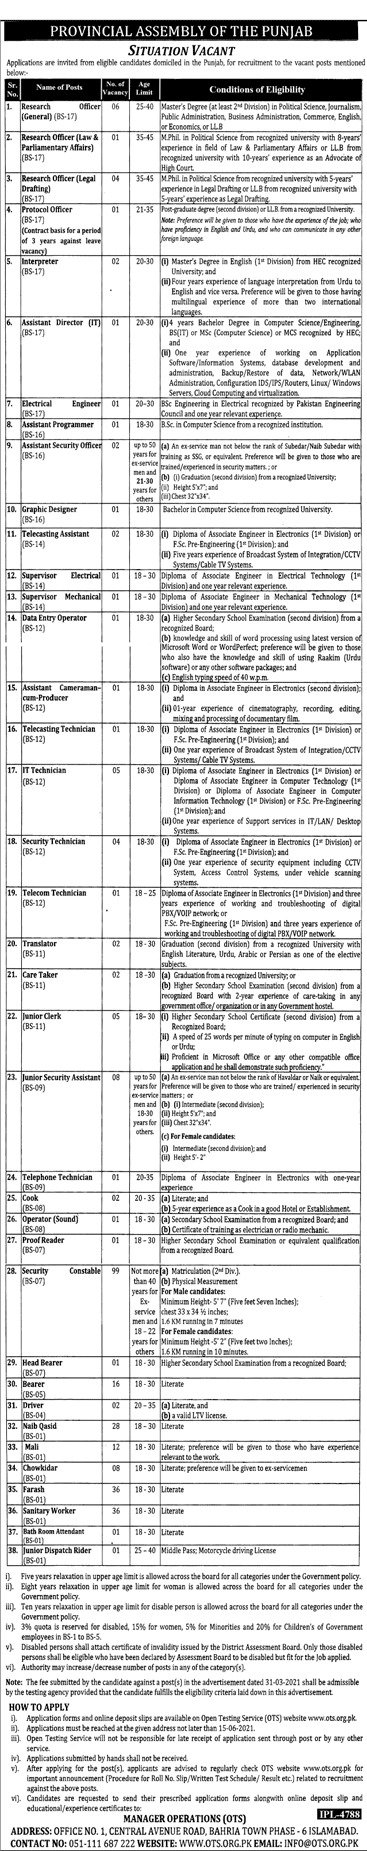 Latest  250 Punjab assembly jobs | Punjab assembly jobs 2021 download  advertisement